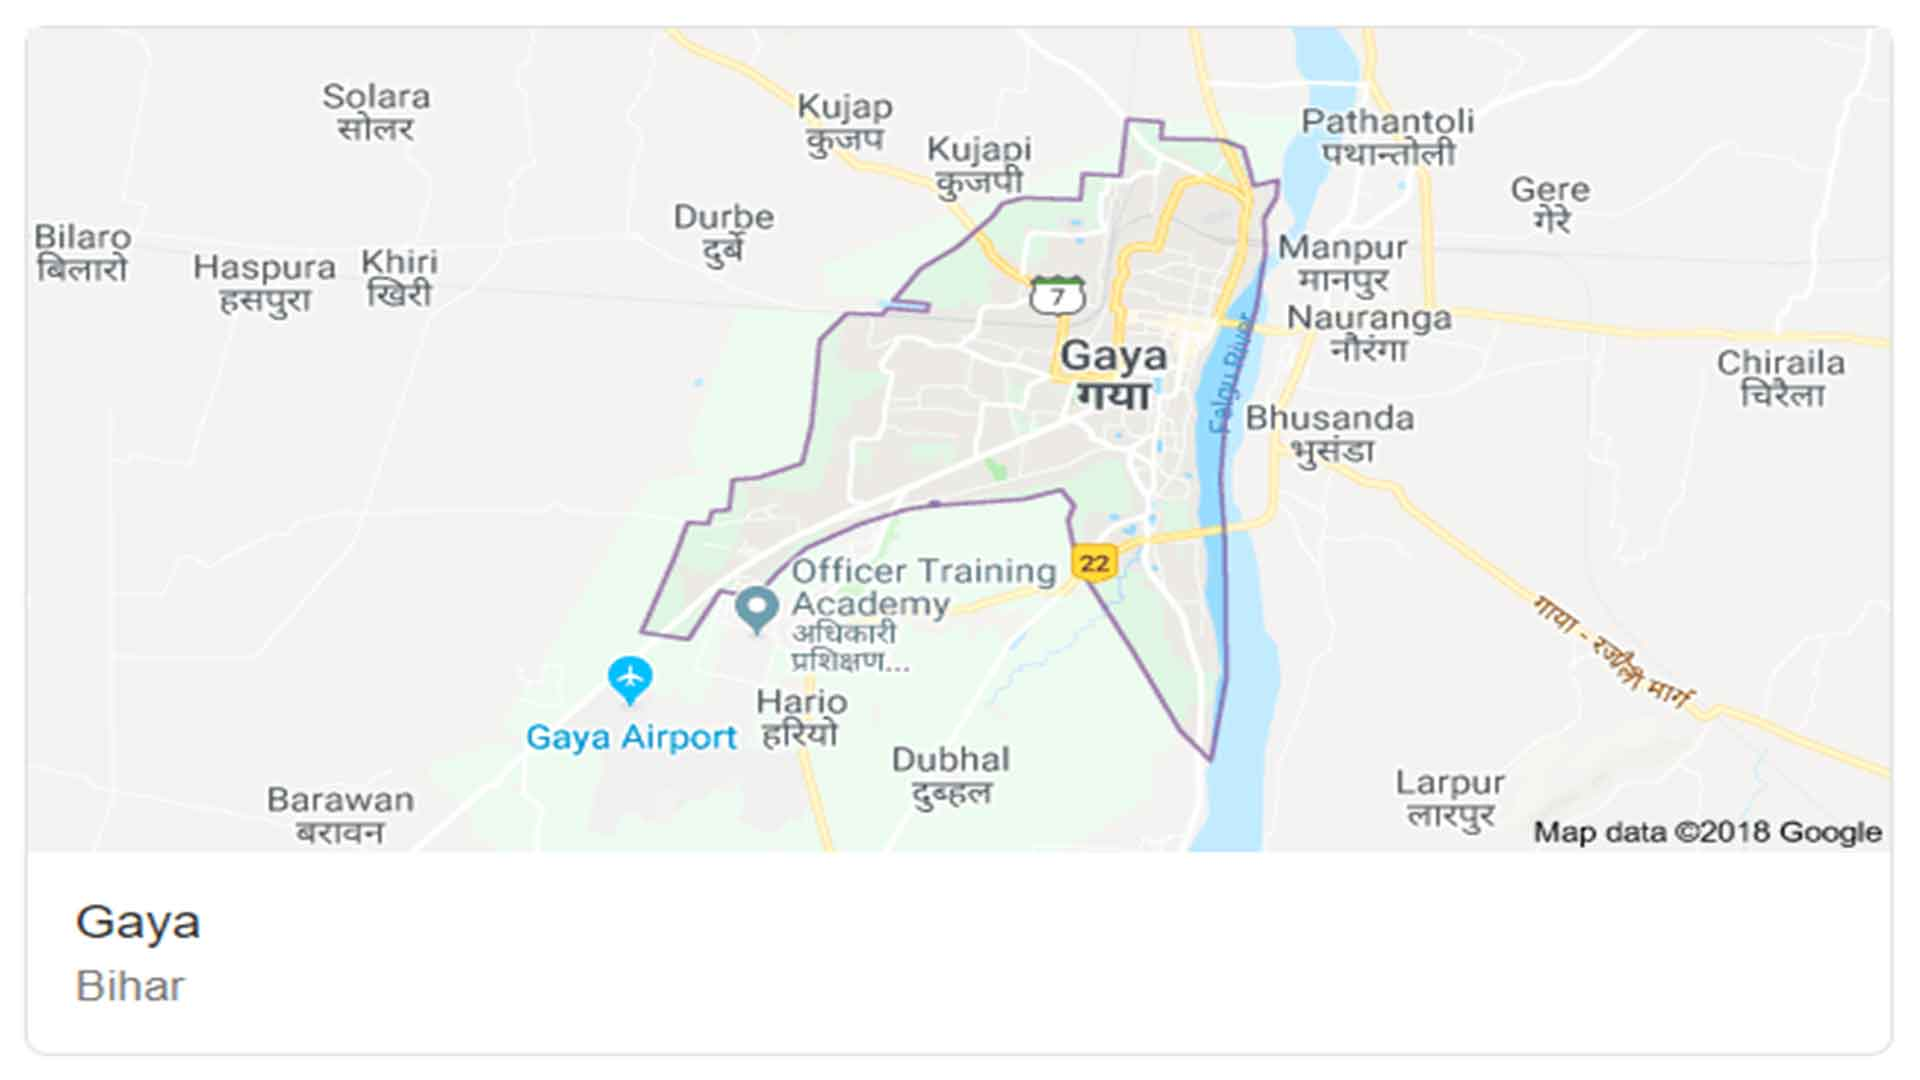 Website Desiging Services in Gaya, Bihar, India